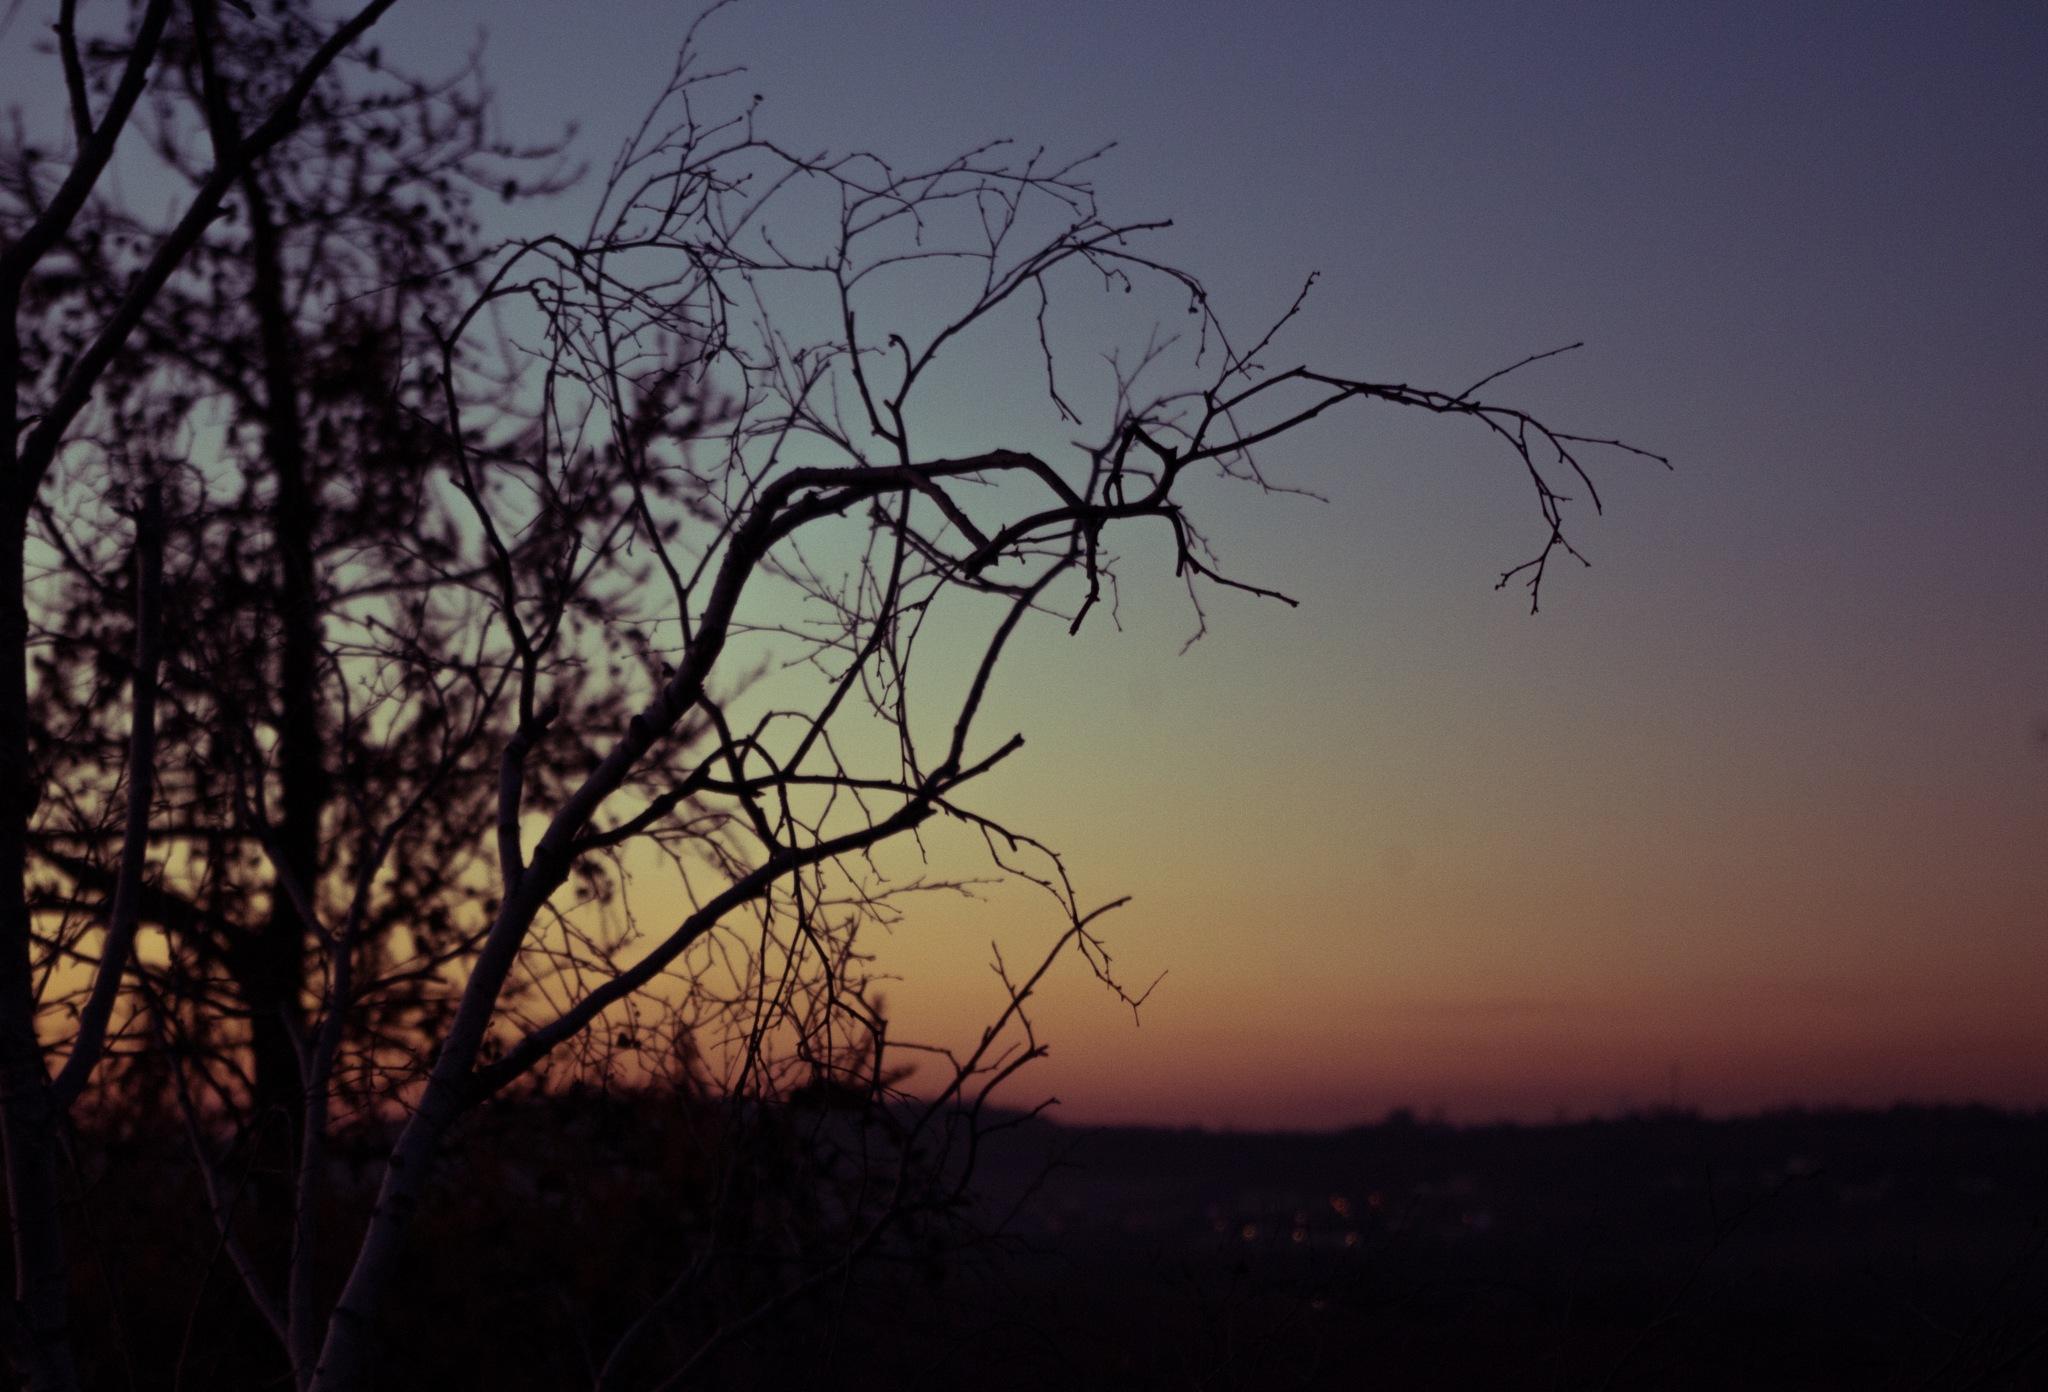 Branches by Martin Bednář